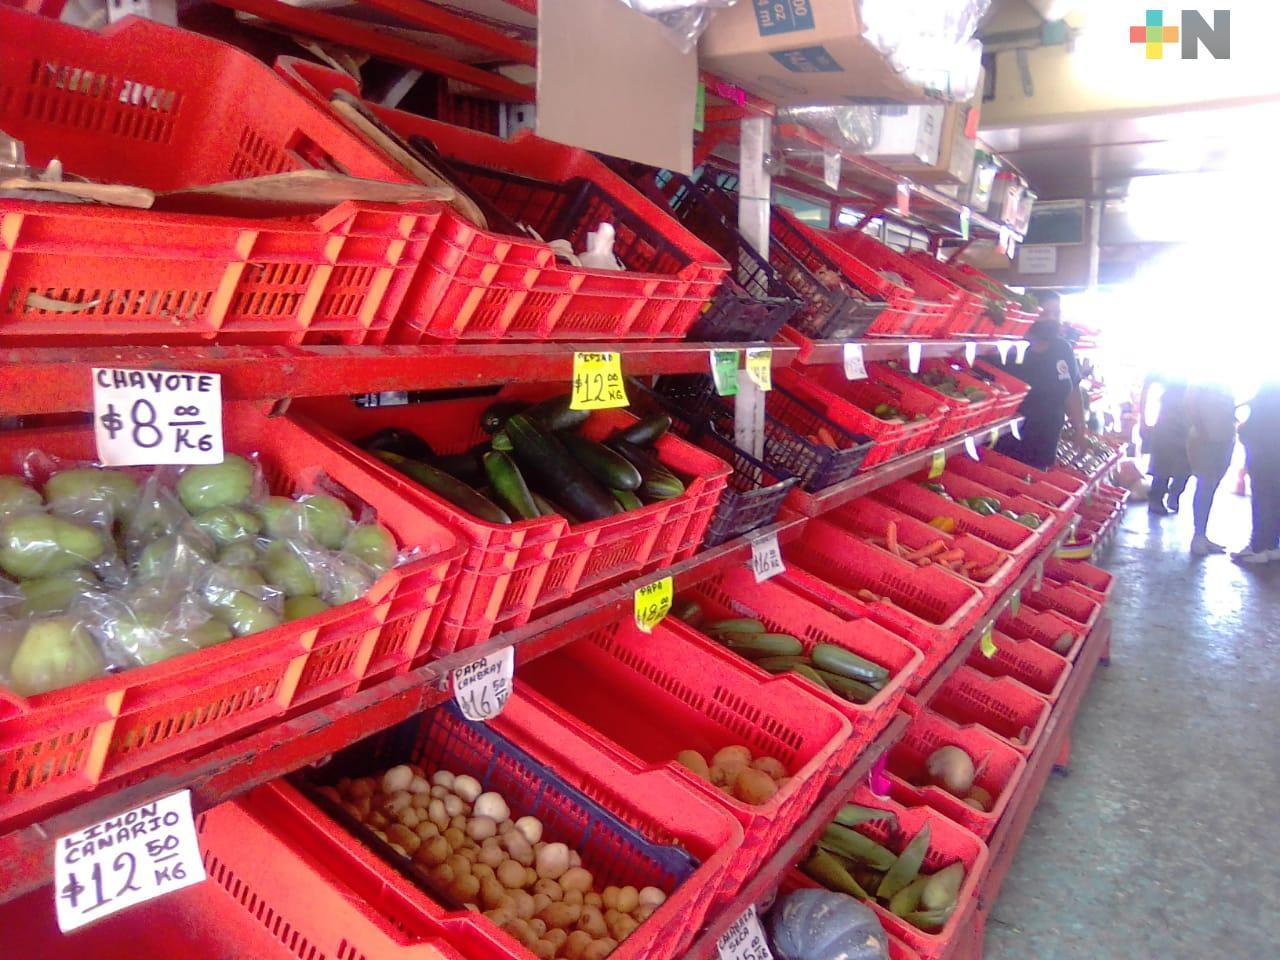 Por pandemia, comerciantes de mercados hacen entregas a domicilio